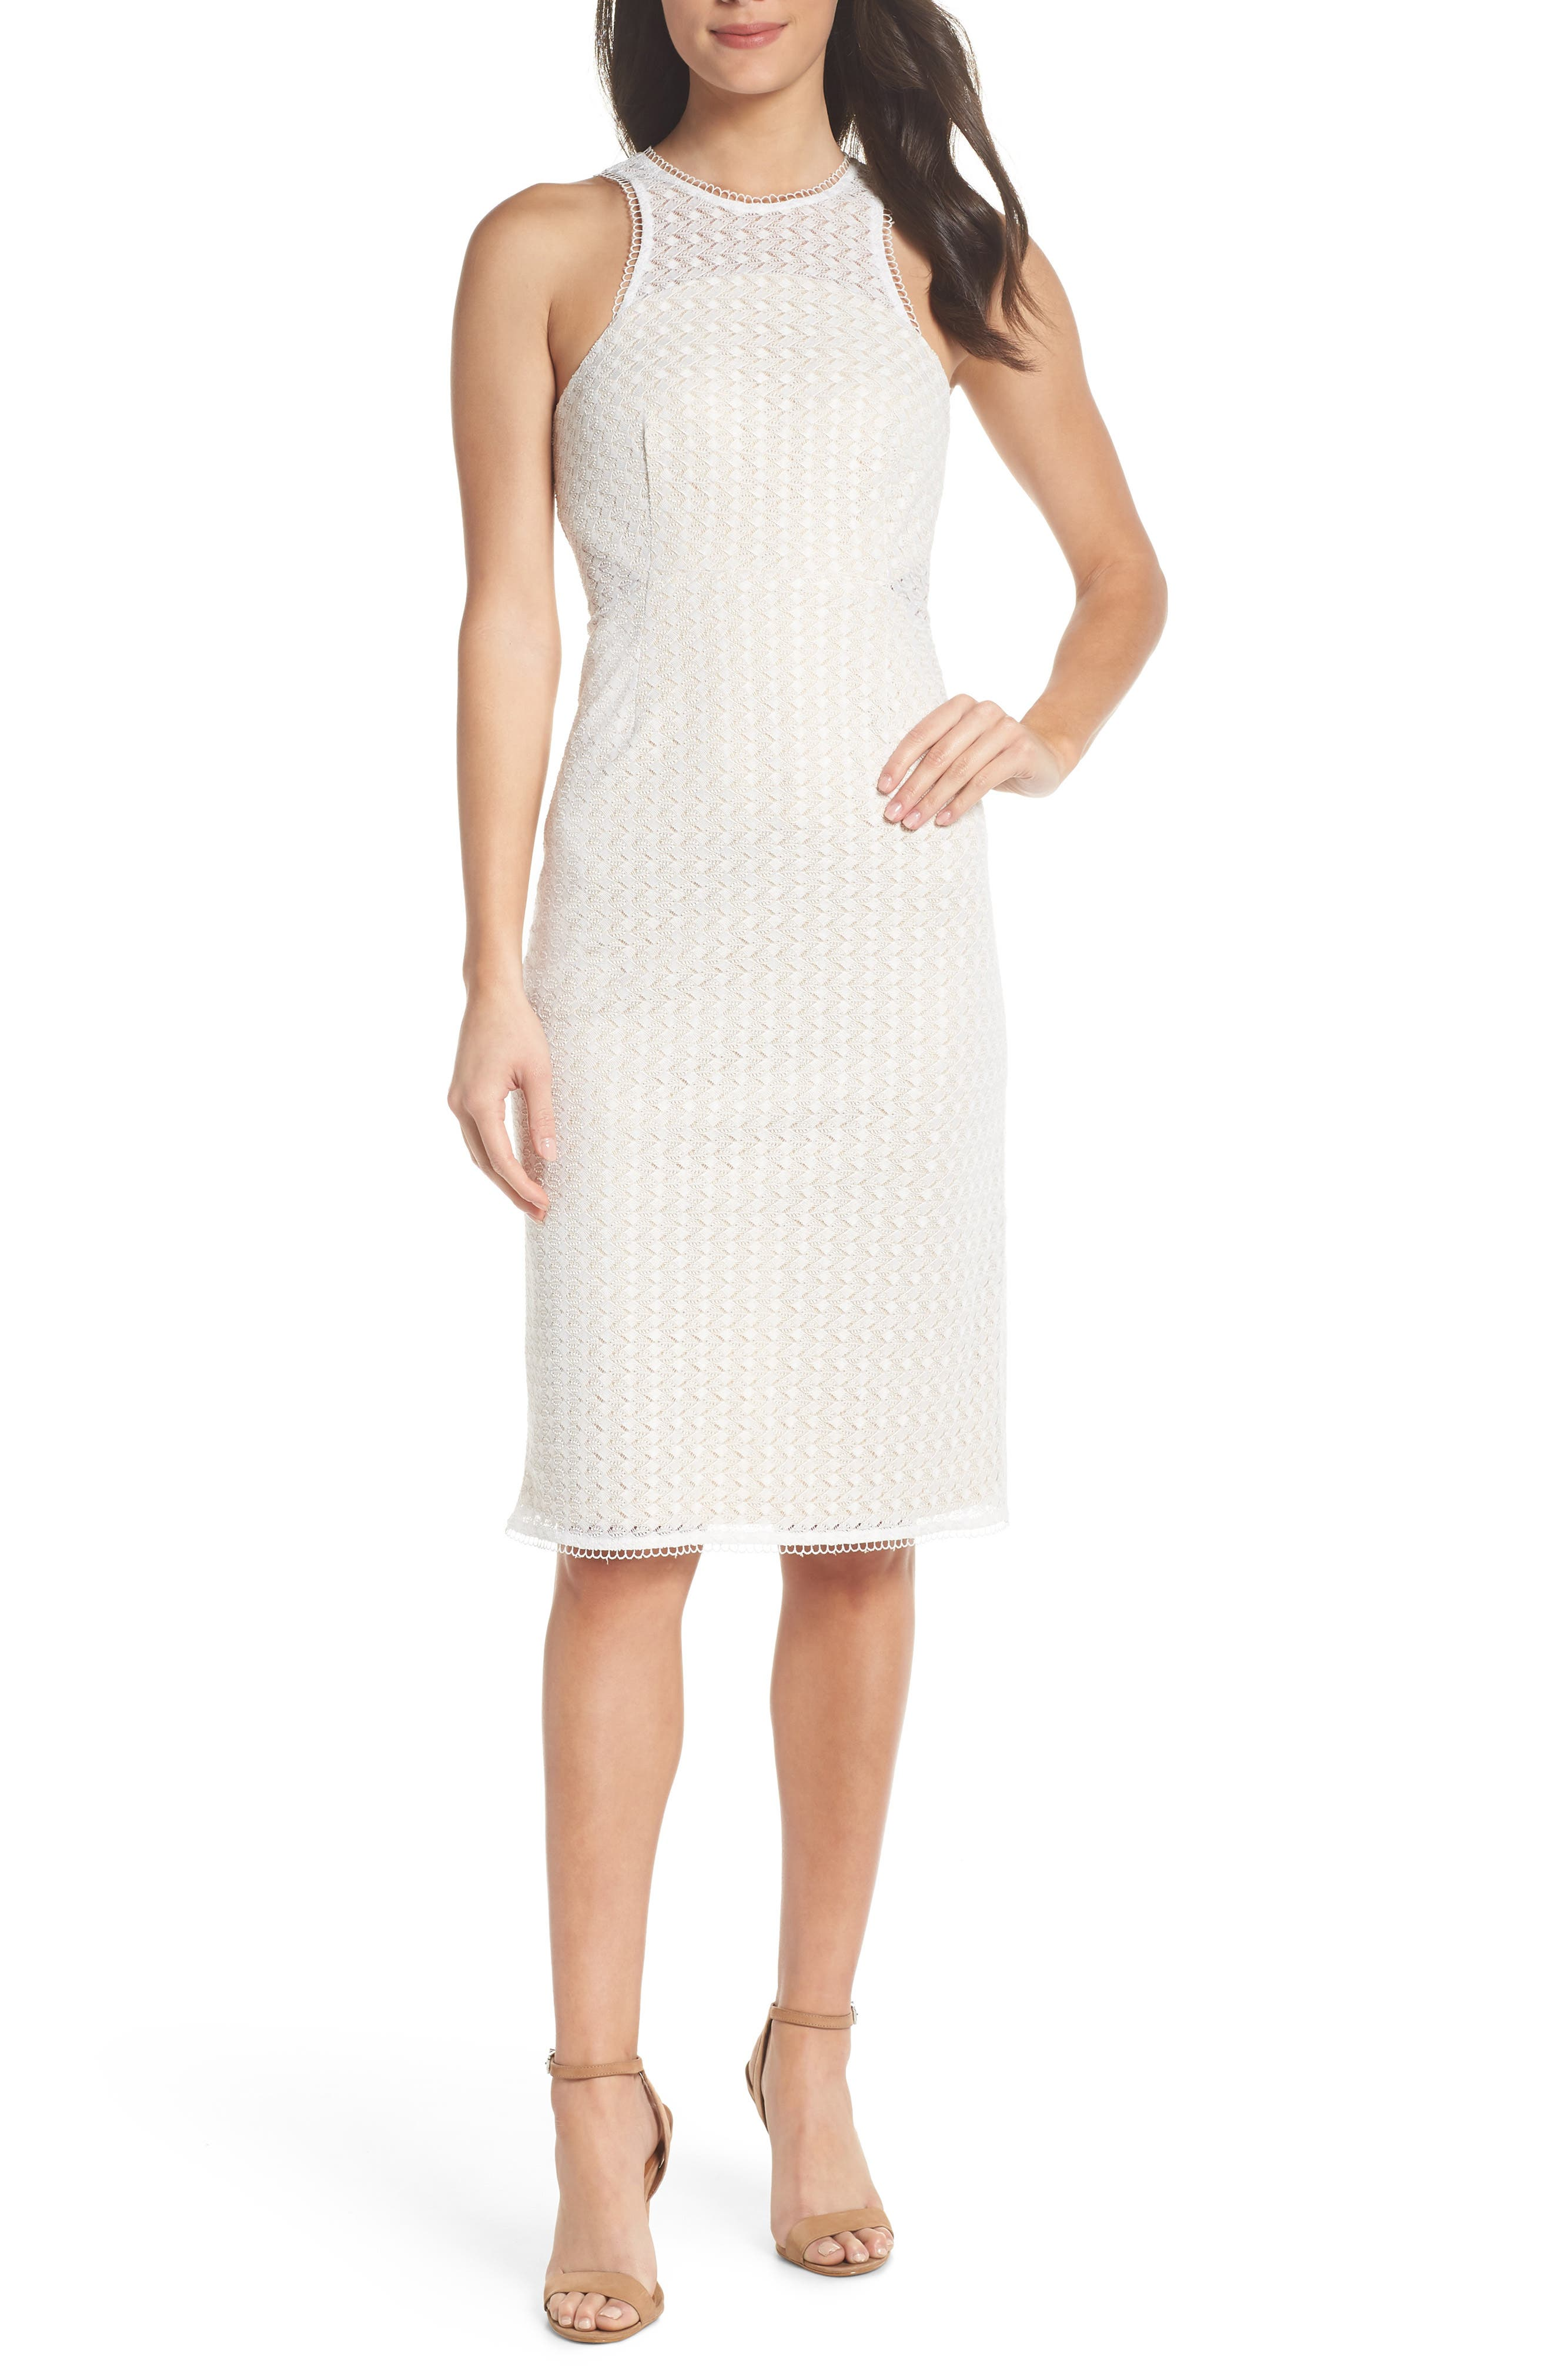 NSR NINA LACE SHEATH DRESS